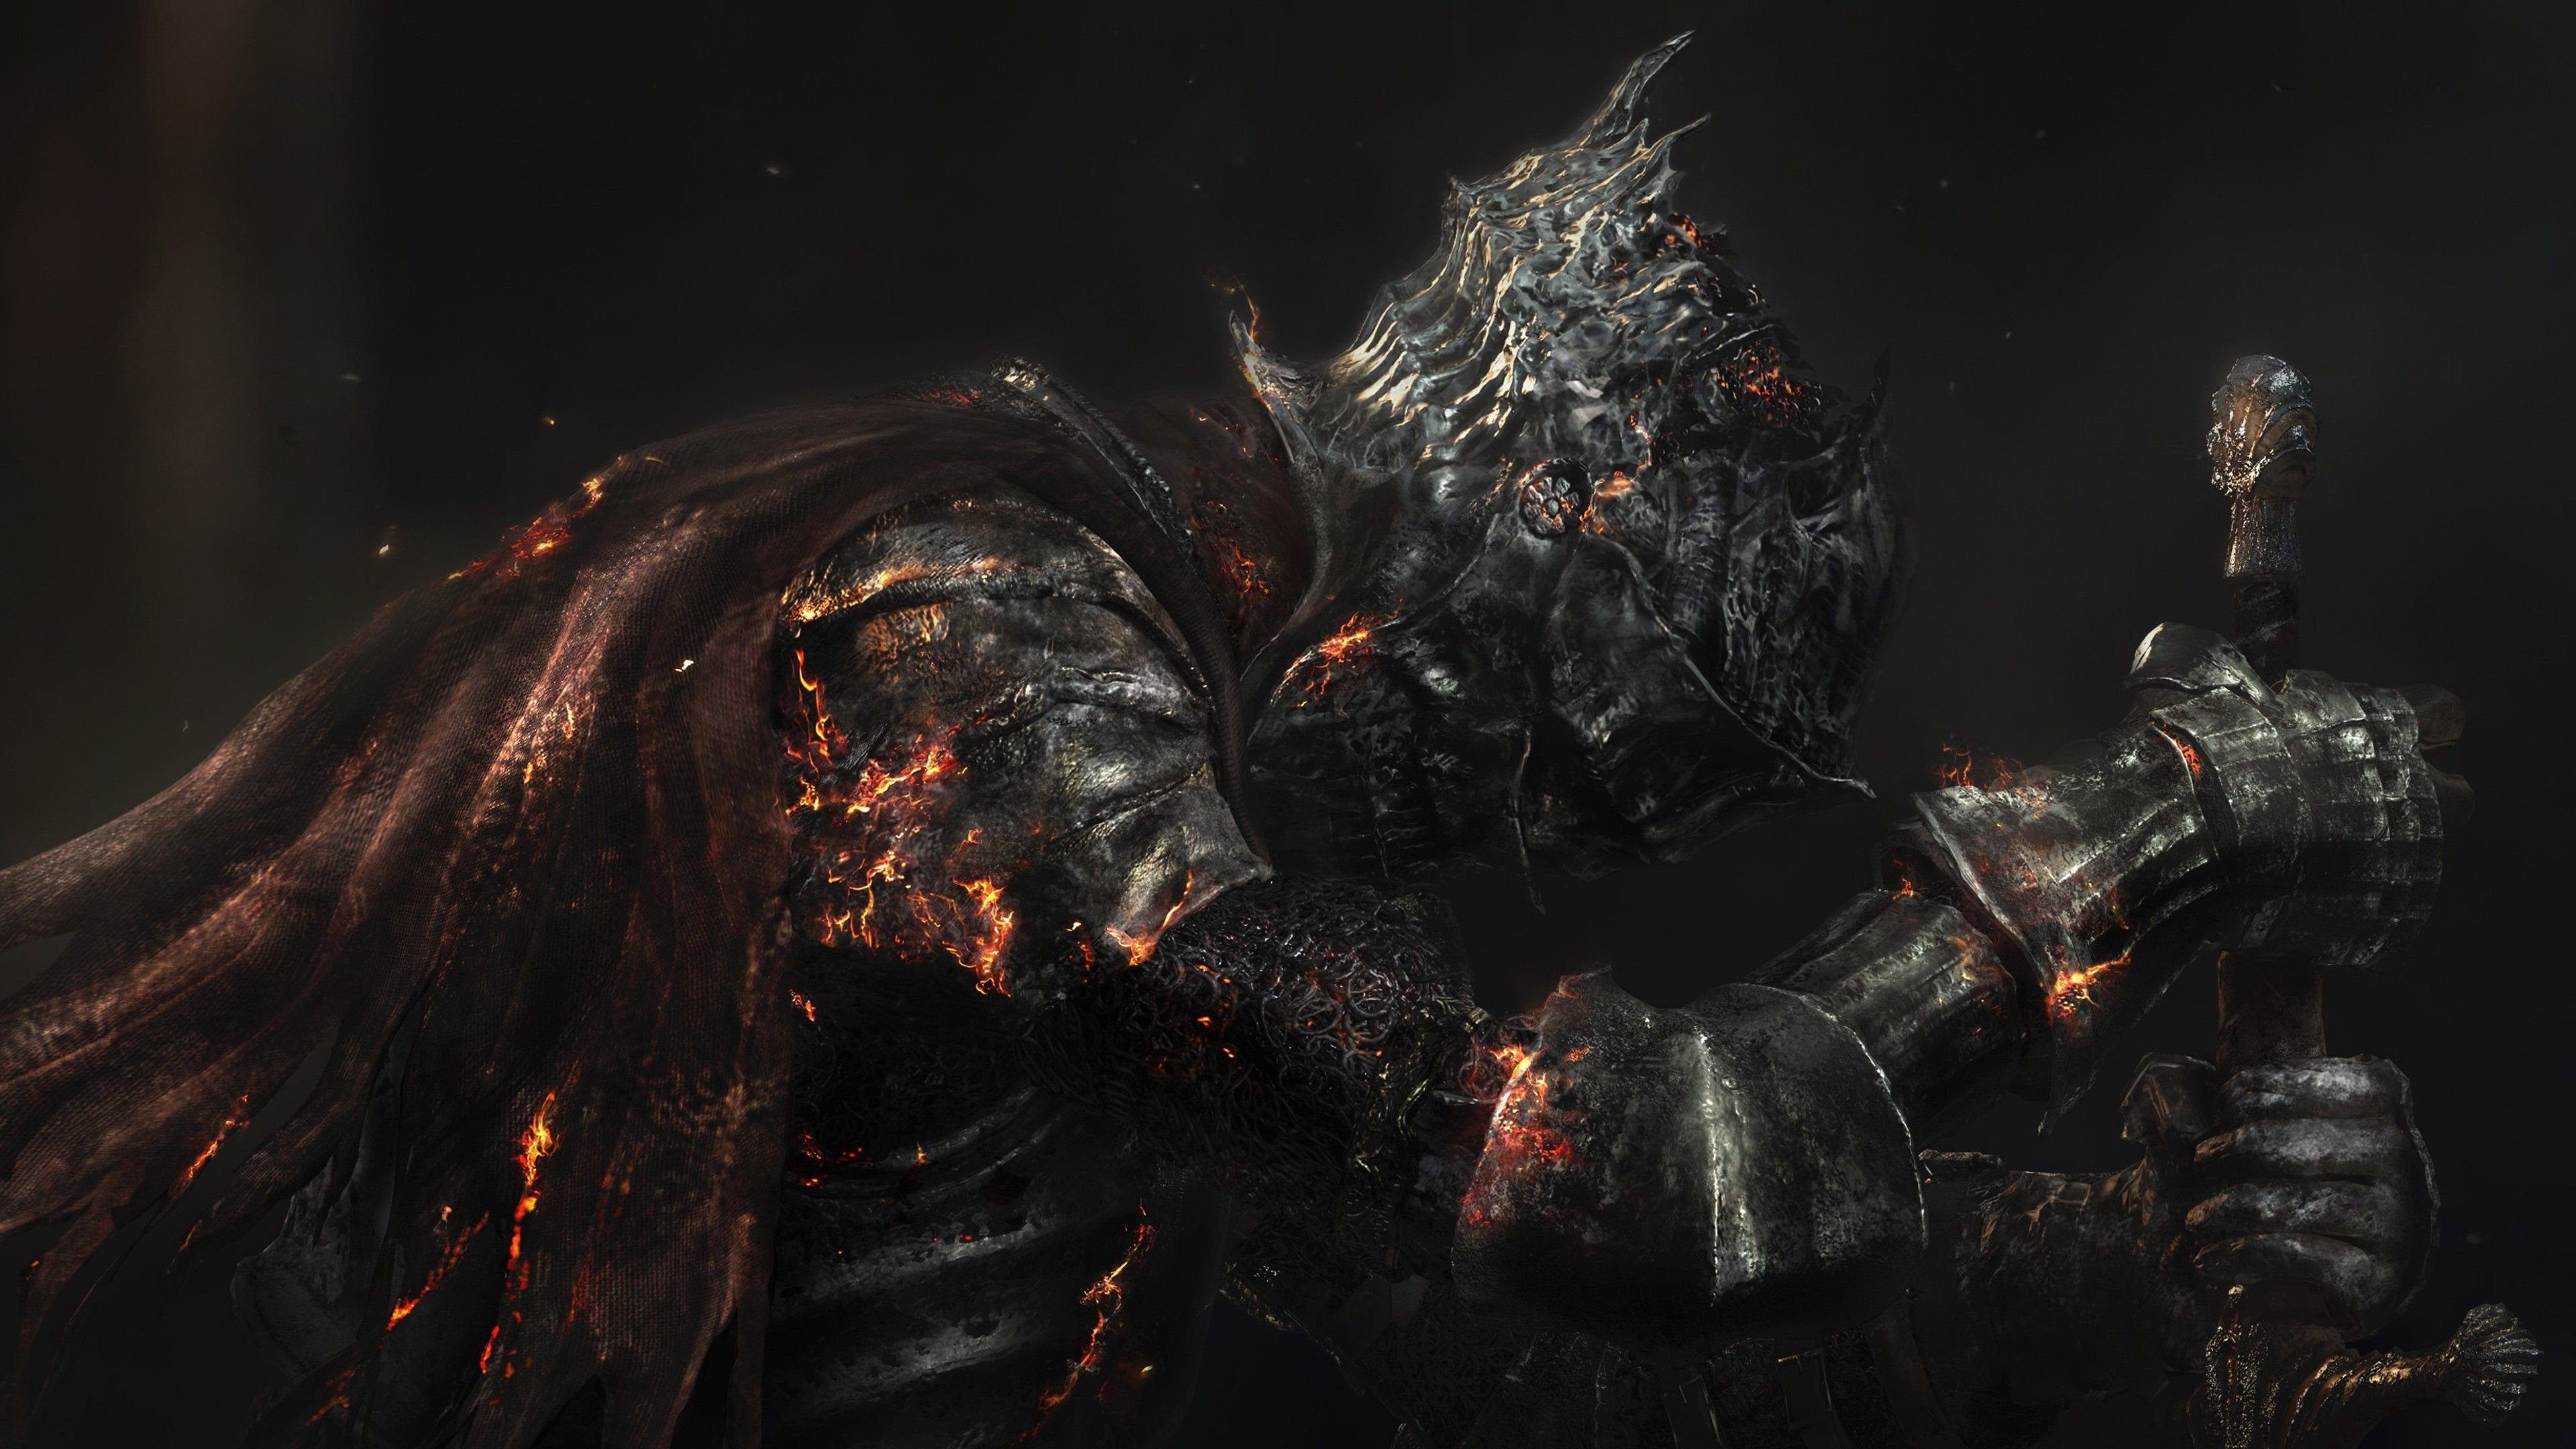 Pin By Mustafa Ghost On Dark Souls Dark Souls Wallpaper Dark Souls Dark Souls 3